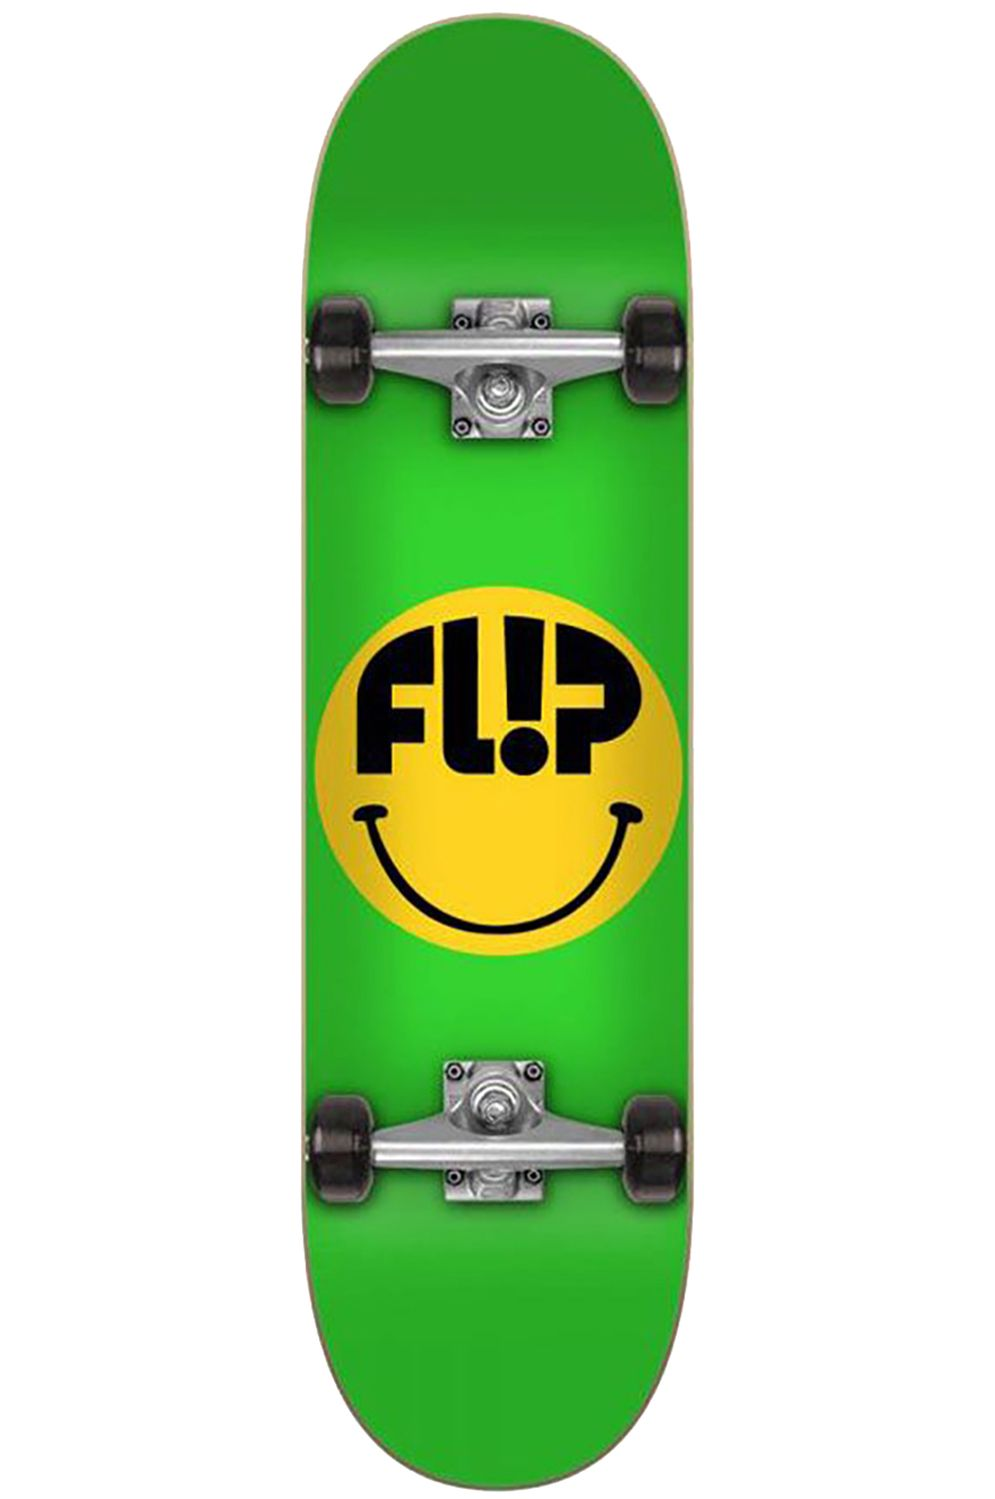 "Flip Skate 8.25"" X 32.31"" ODYSSEY SMILEY Green"